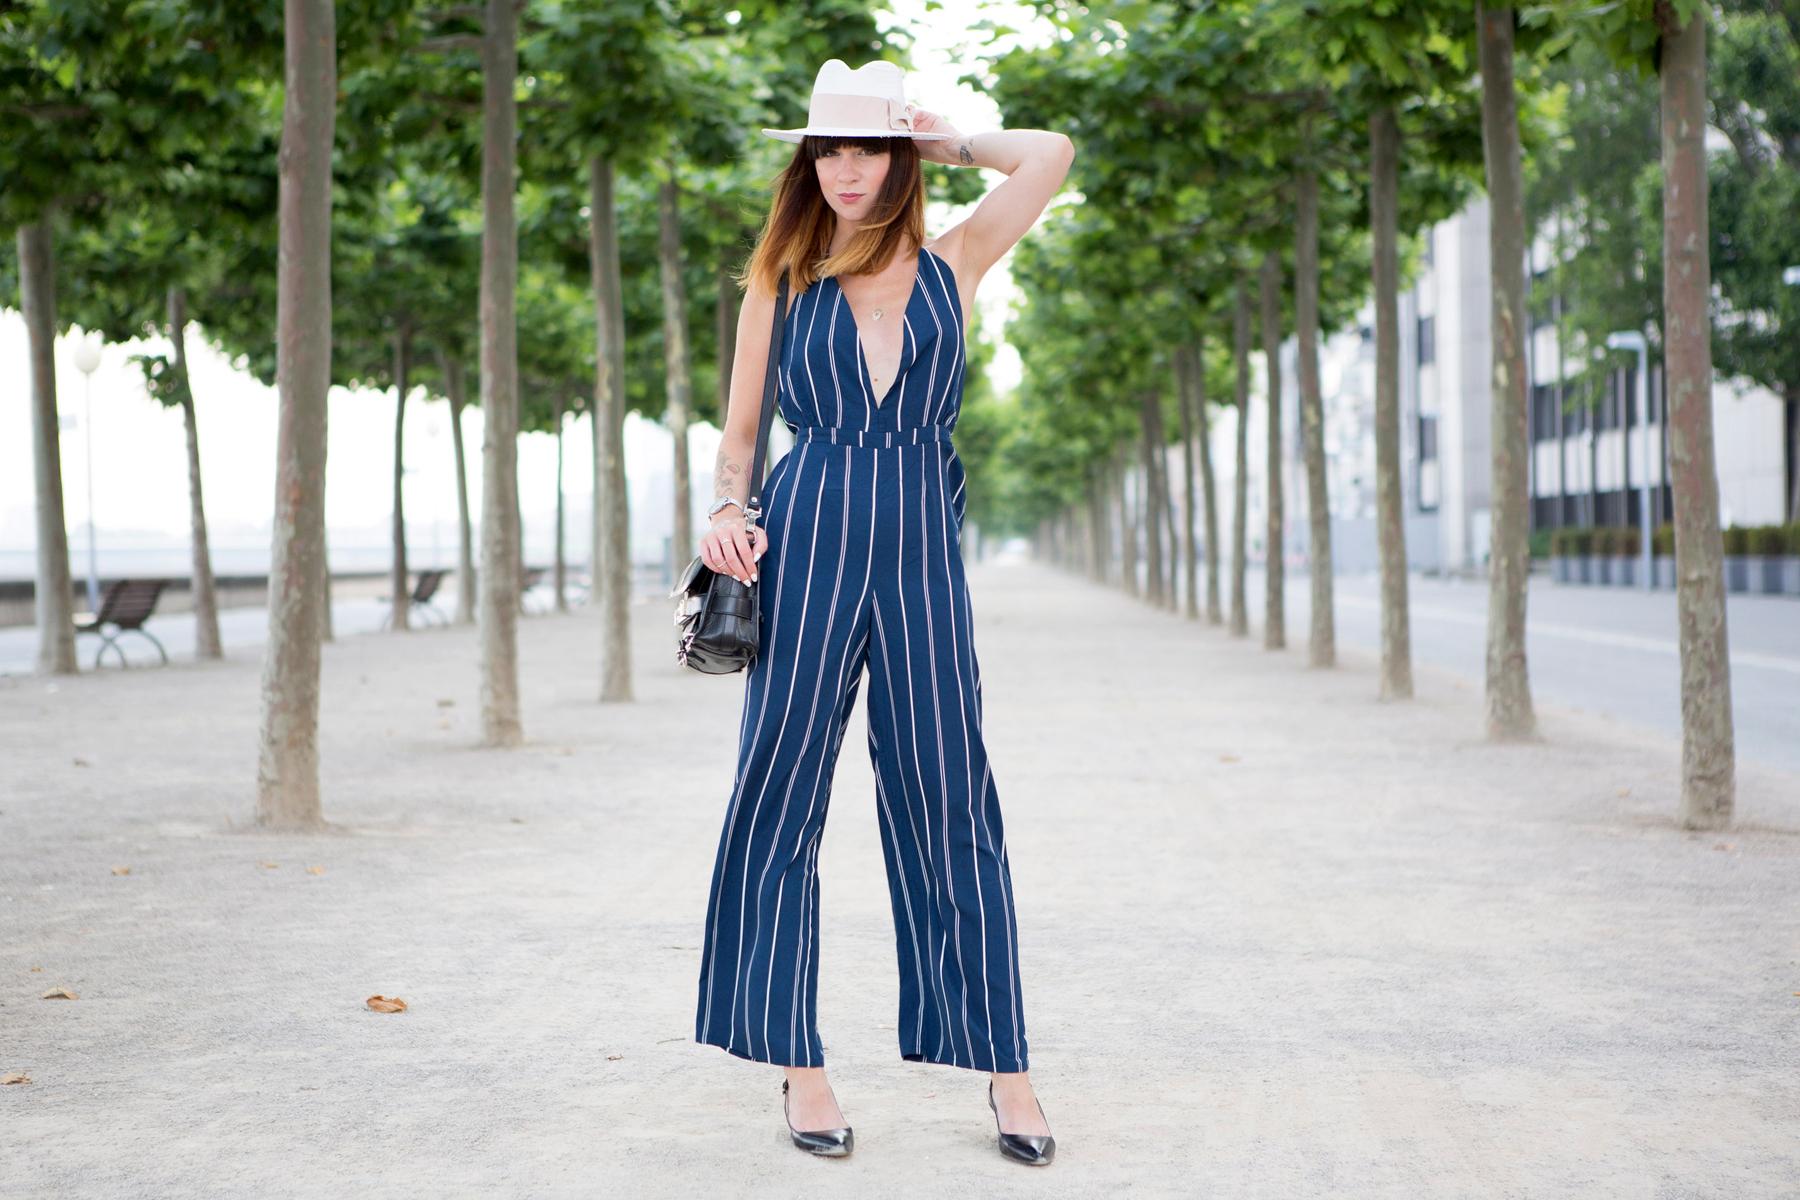 forever 21 jumpsuit overall streifen blue hat summer ombre cats & dogs ricarda schernus blogger berlin 6